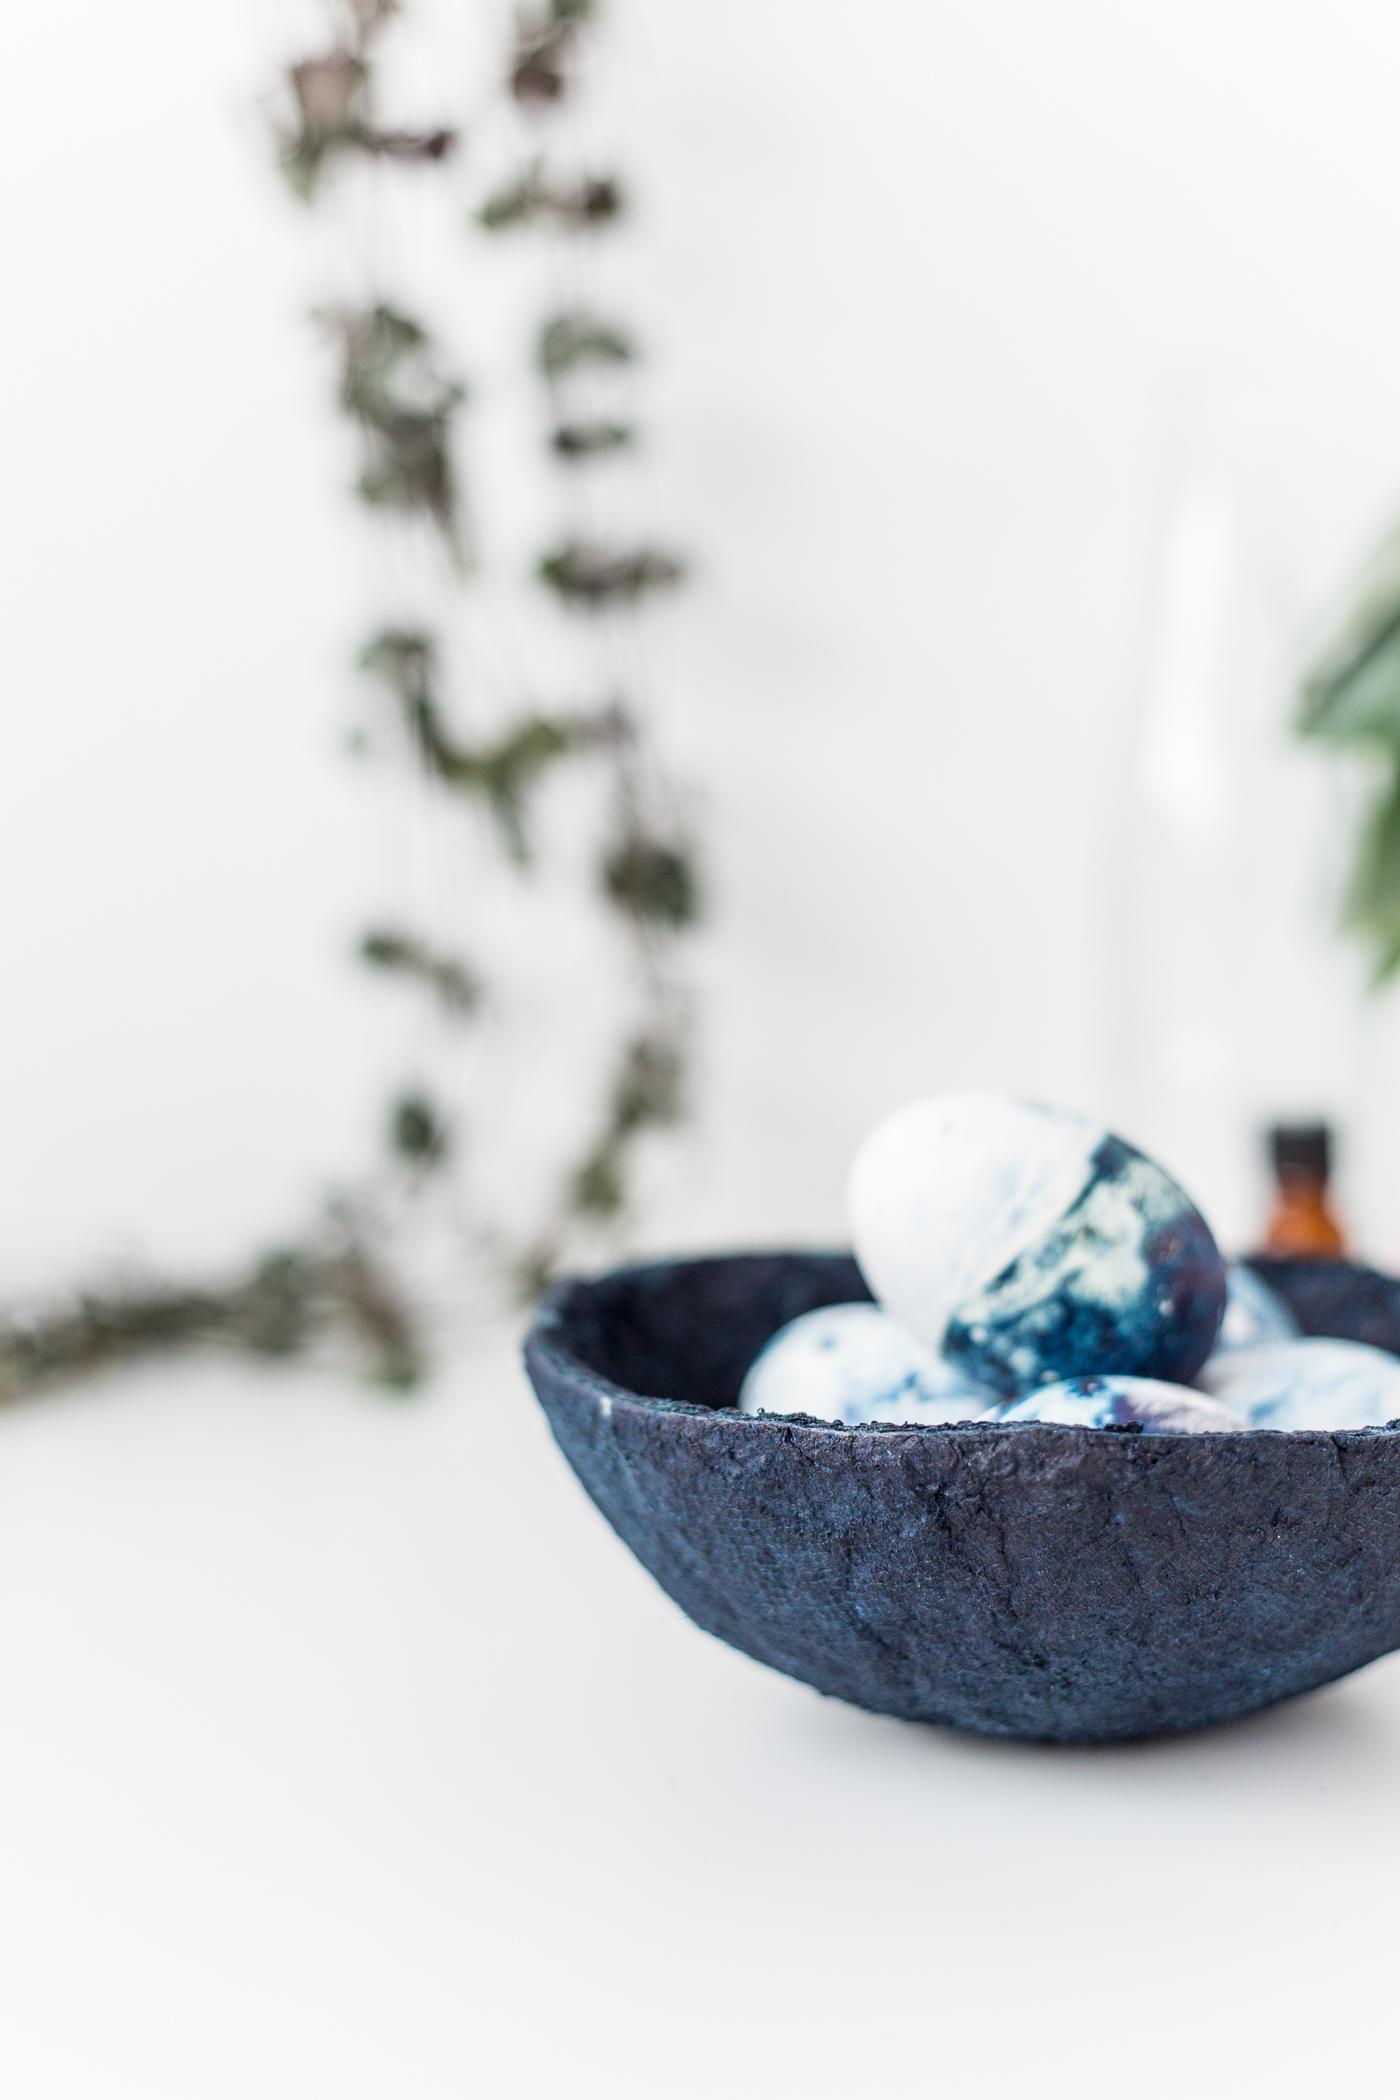 DIY Indigo Paper Bowls Tutorial | @fallfordiy